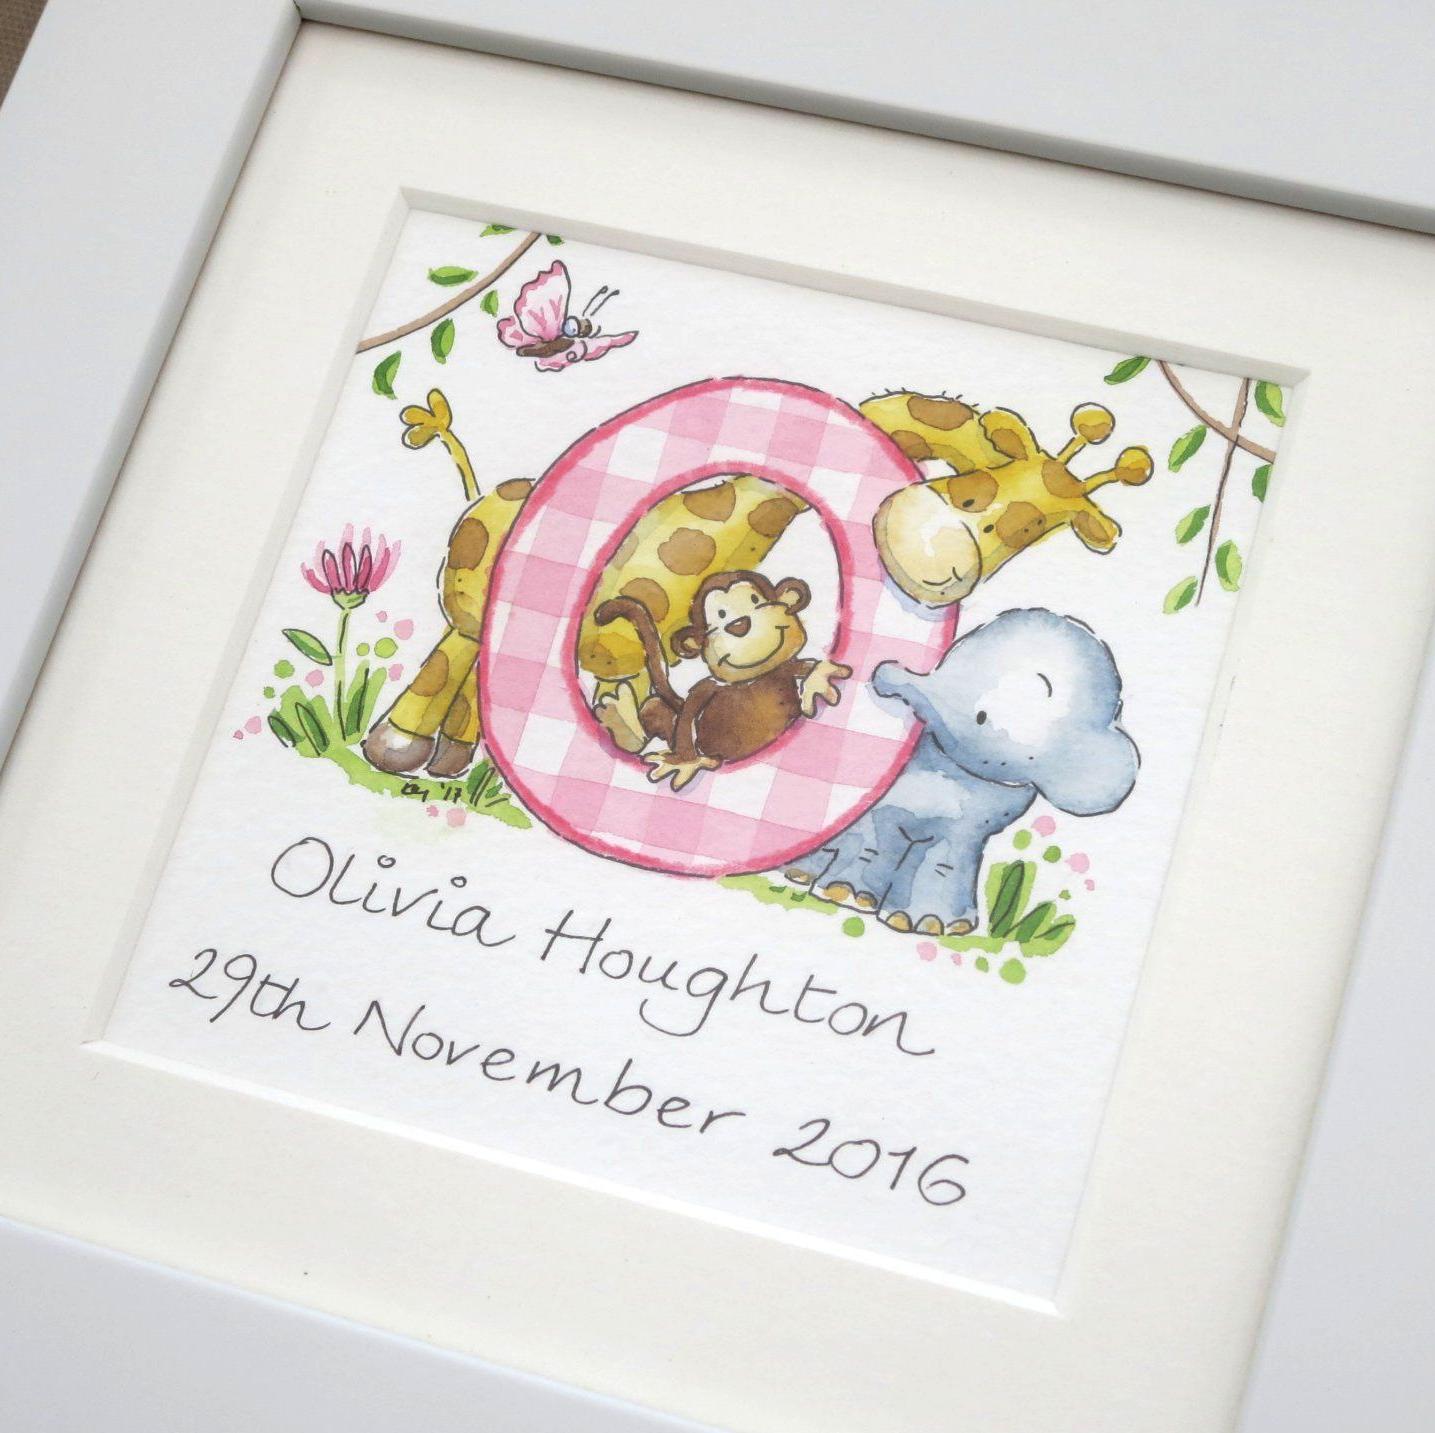 Olivia framed